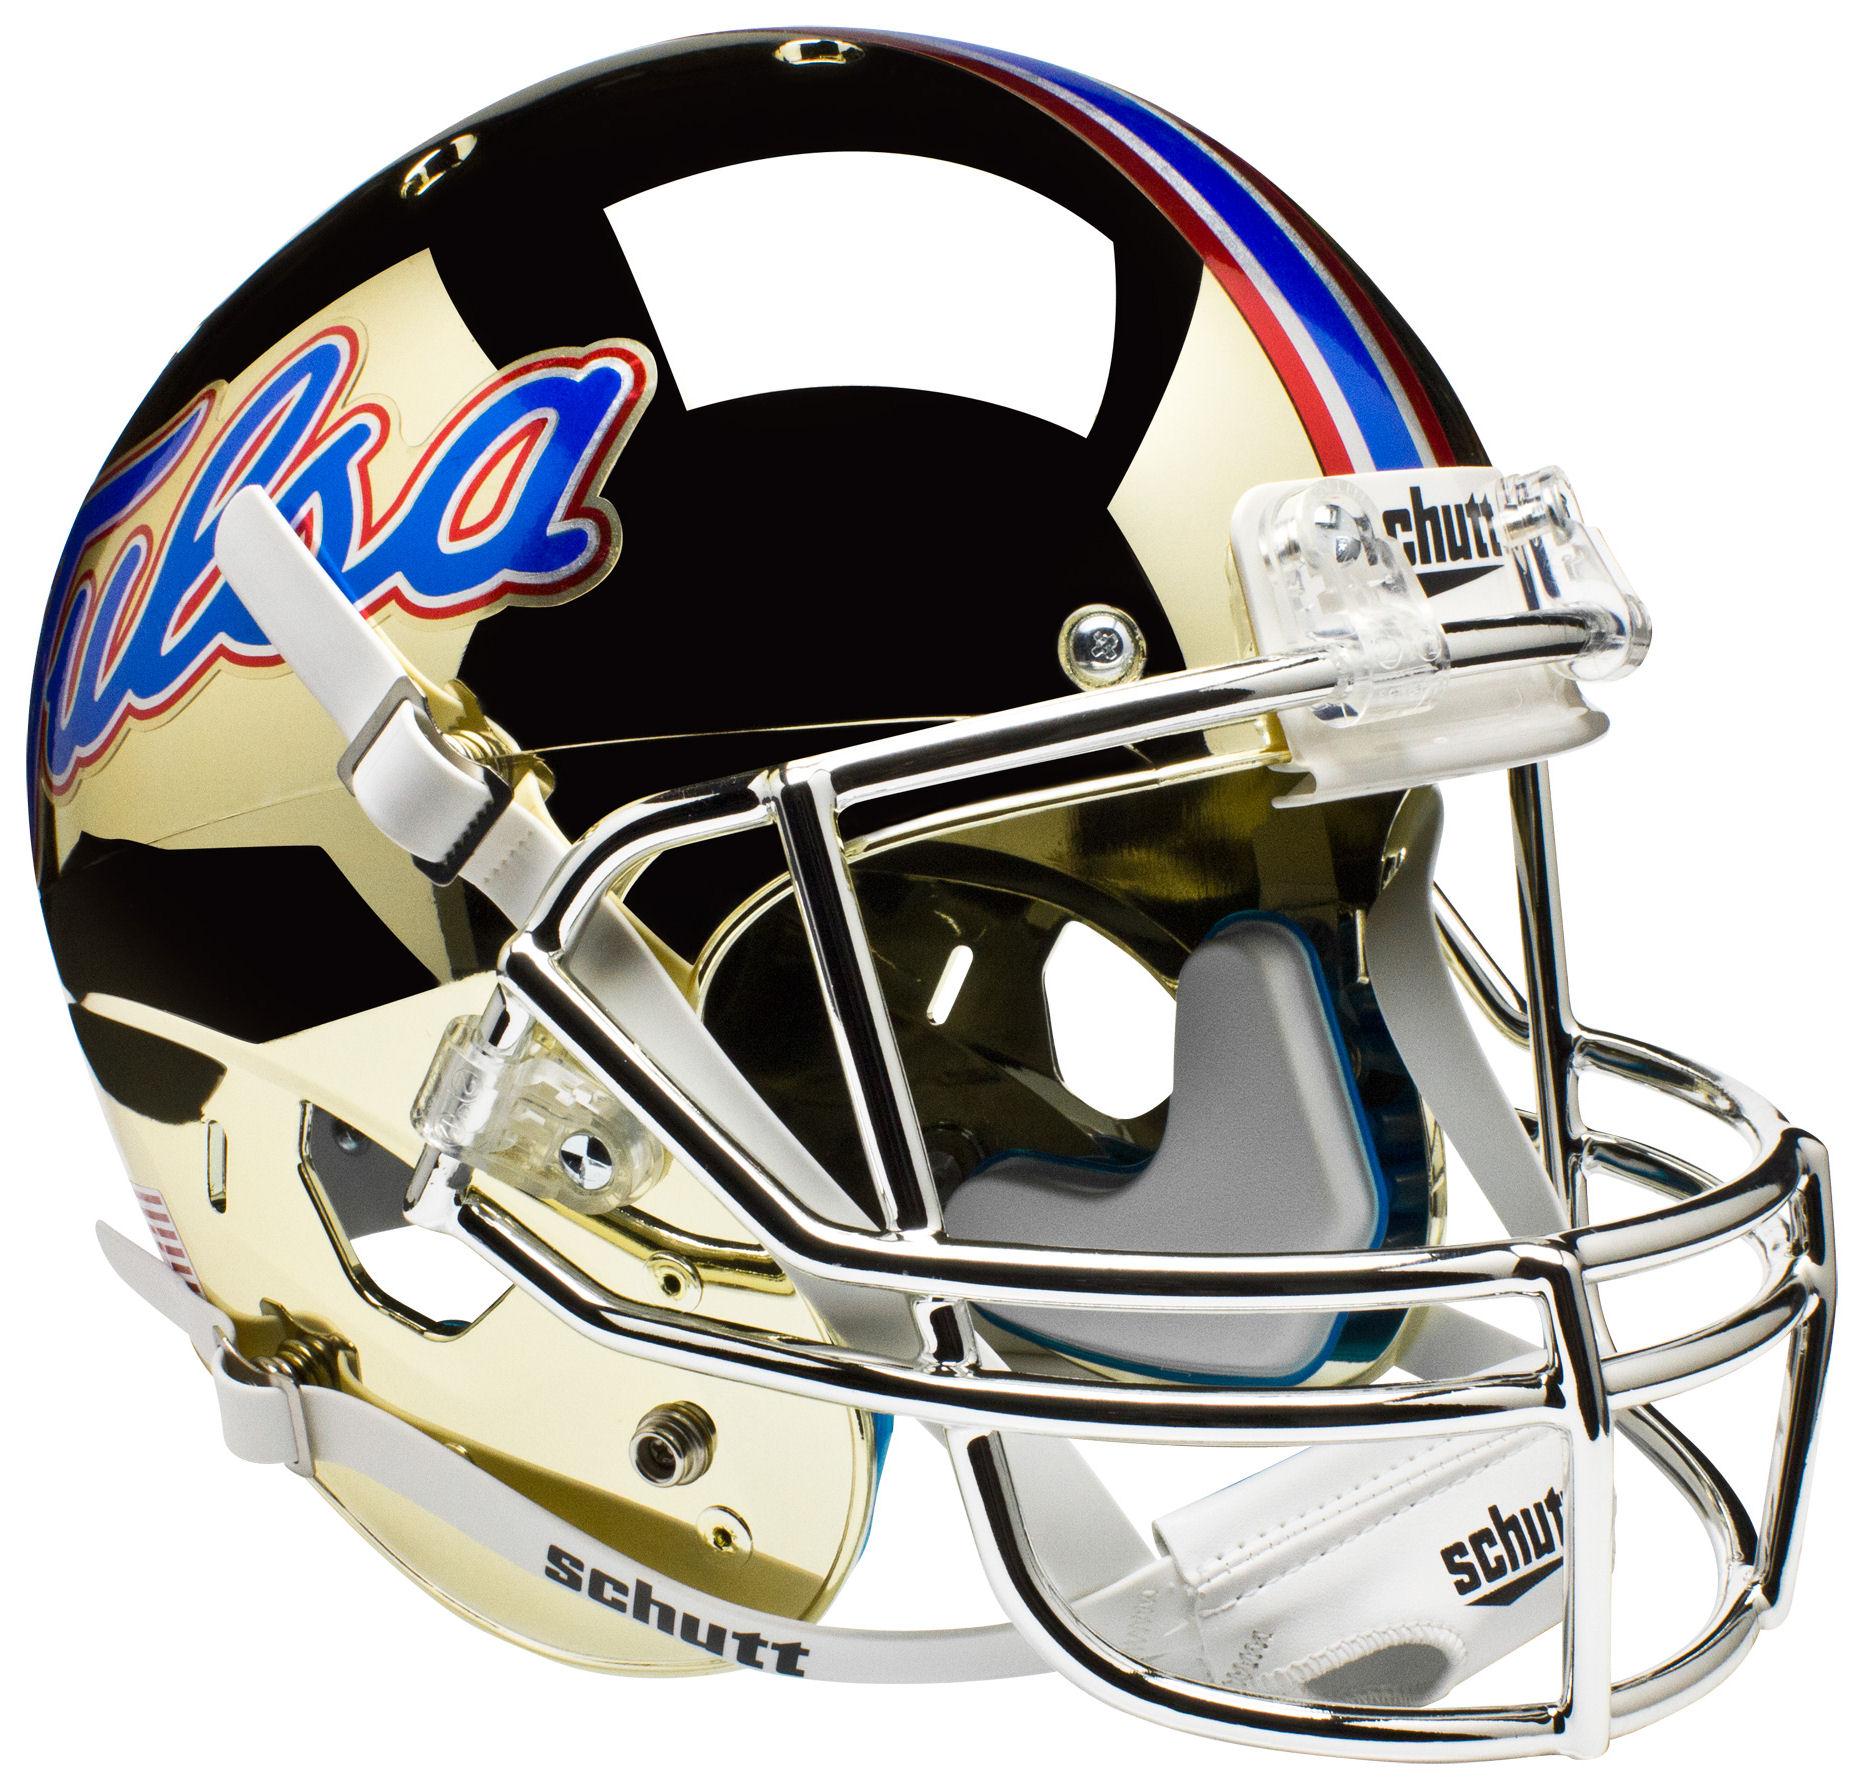 Tulsa Golden Hurricane Full XP Replica Football Helmet Schutt <B>Chrome</B>